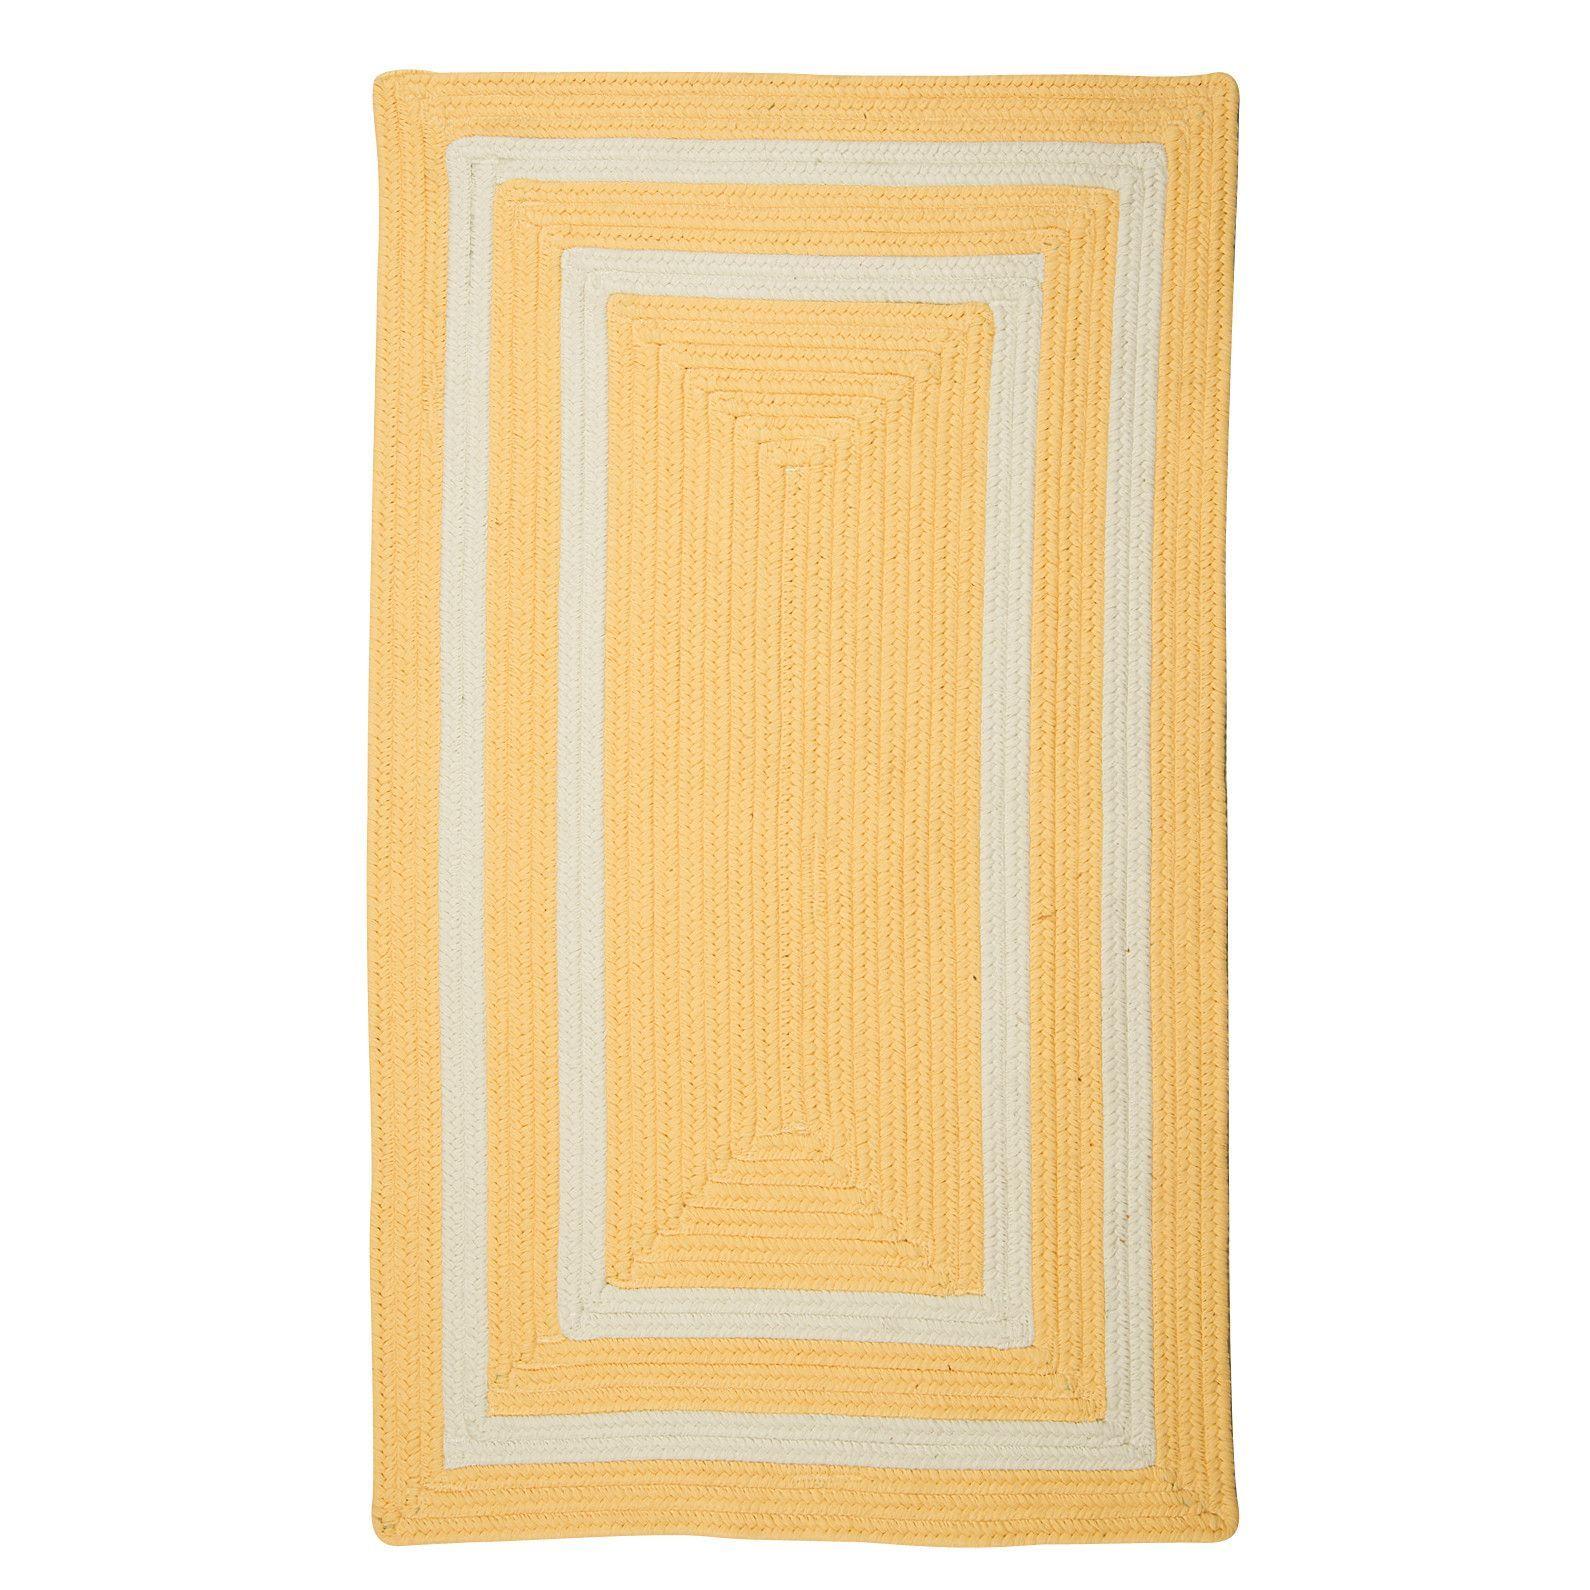 Keats Hand-Woven Outdoor Yellow Area Rug